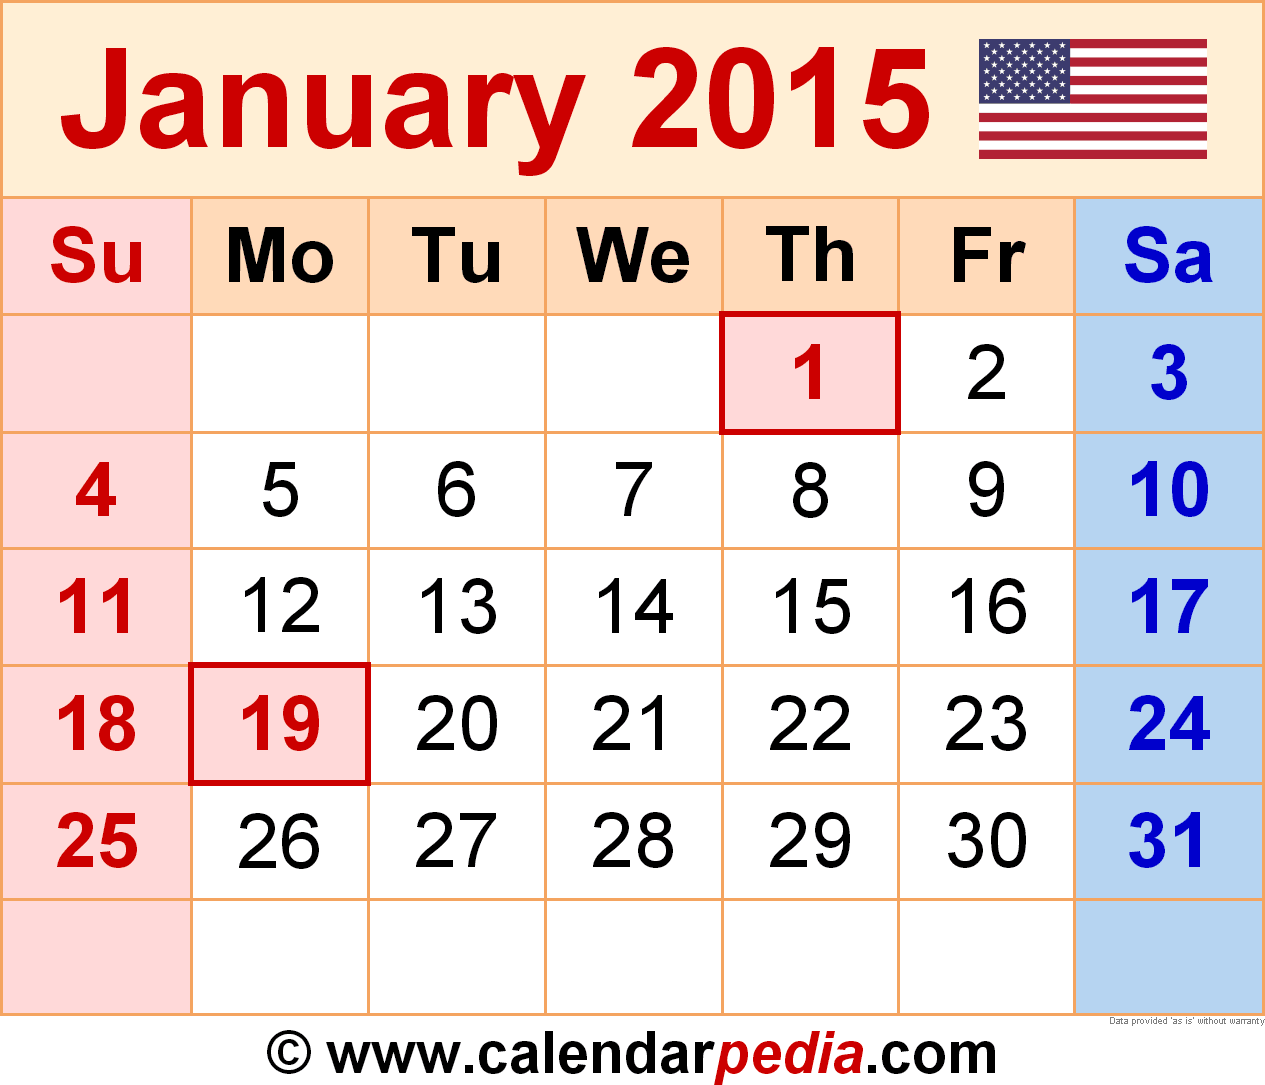 January 2015 Calendar Free Templates For Word Excel Pdf June Calendar Printable Calendar Printables August Calendar